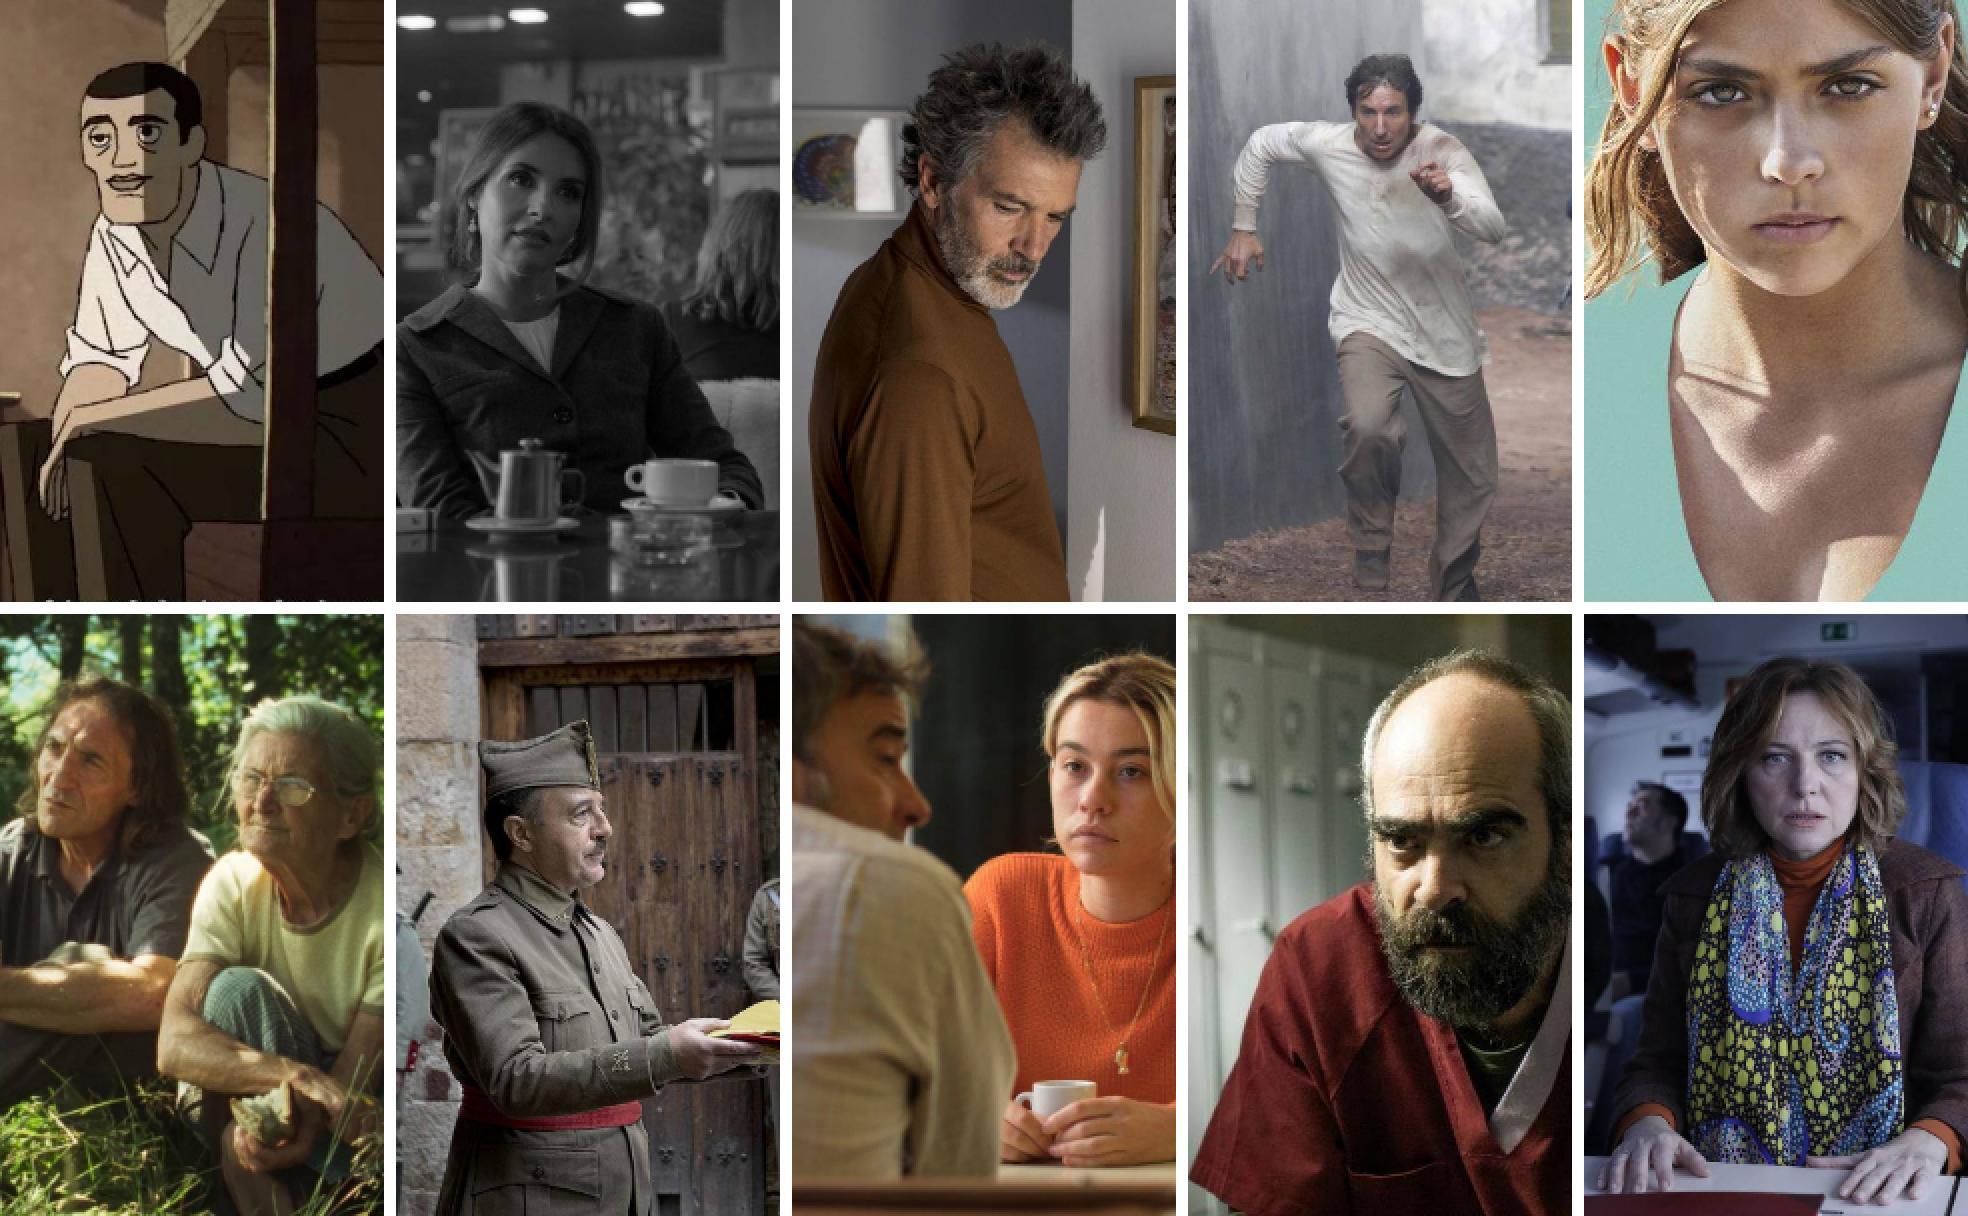 100 Mejores Películas Eróticas Del Cine Español las diez películas del festival de cine español de cáceres | hoy